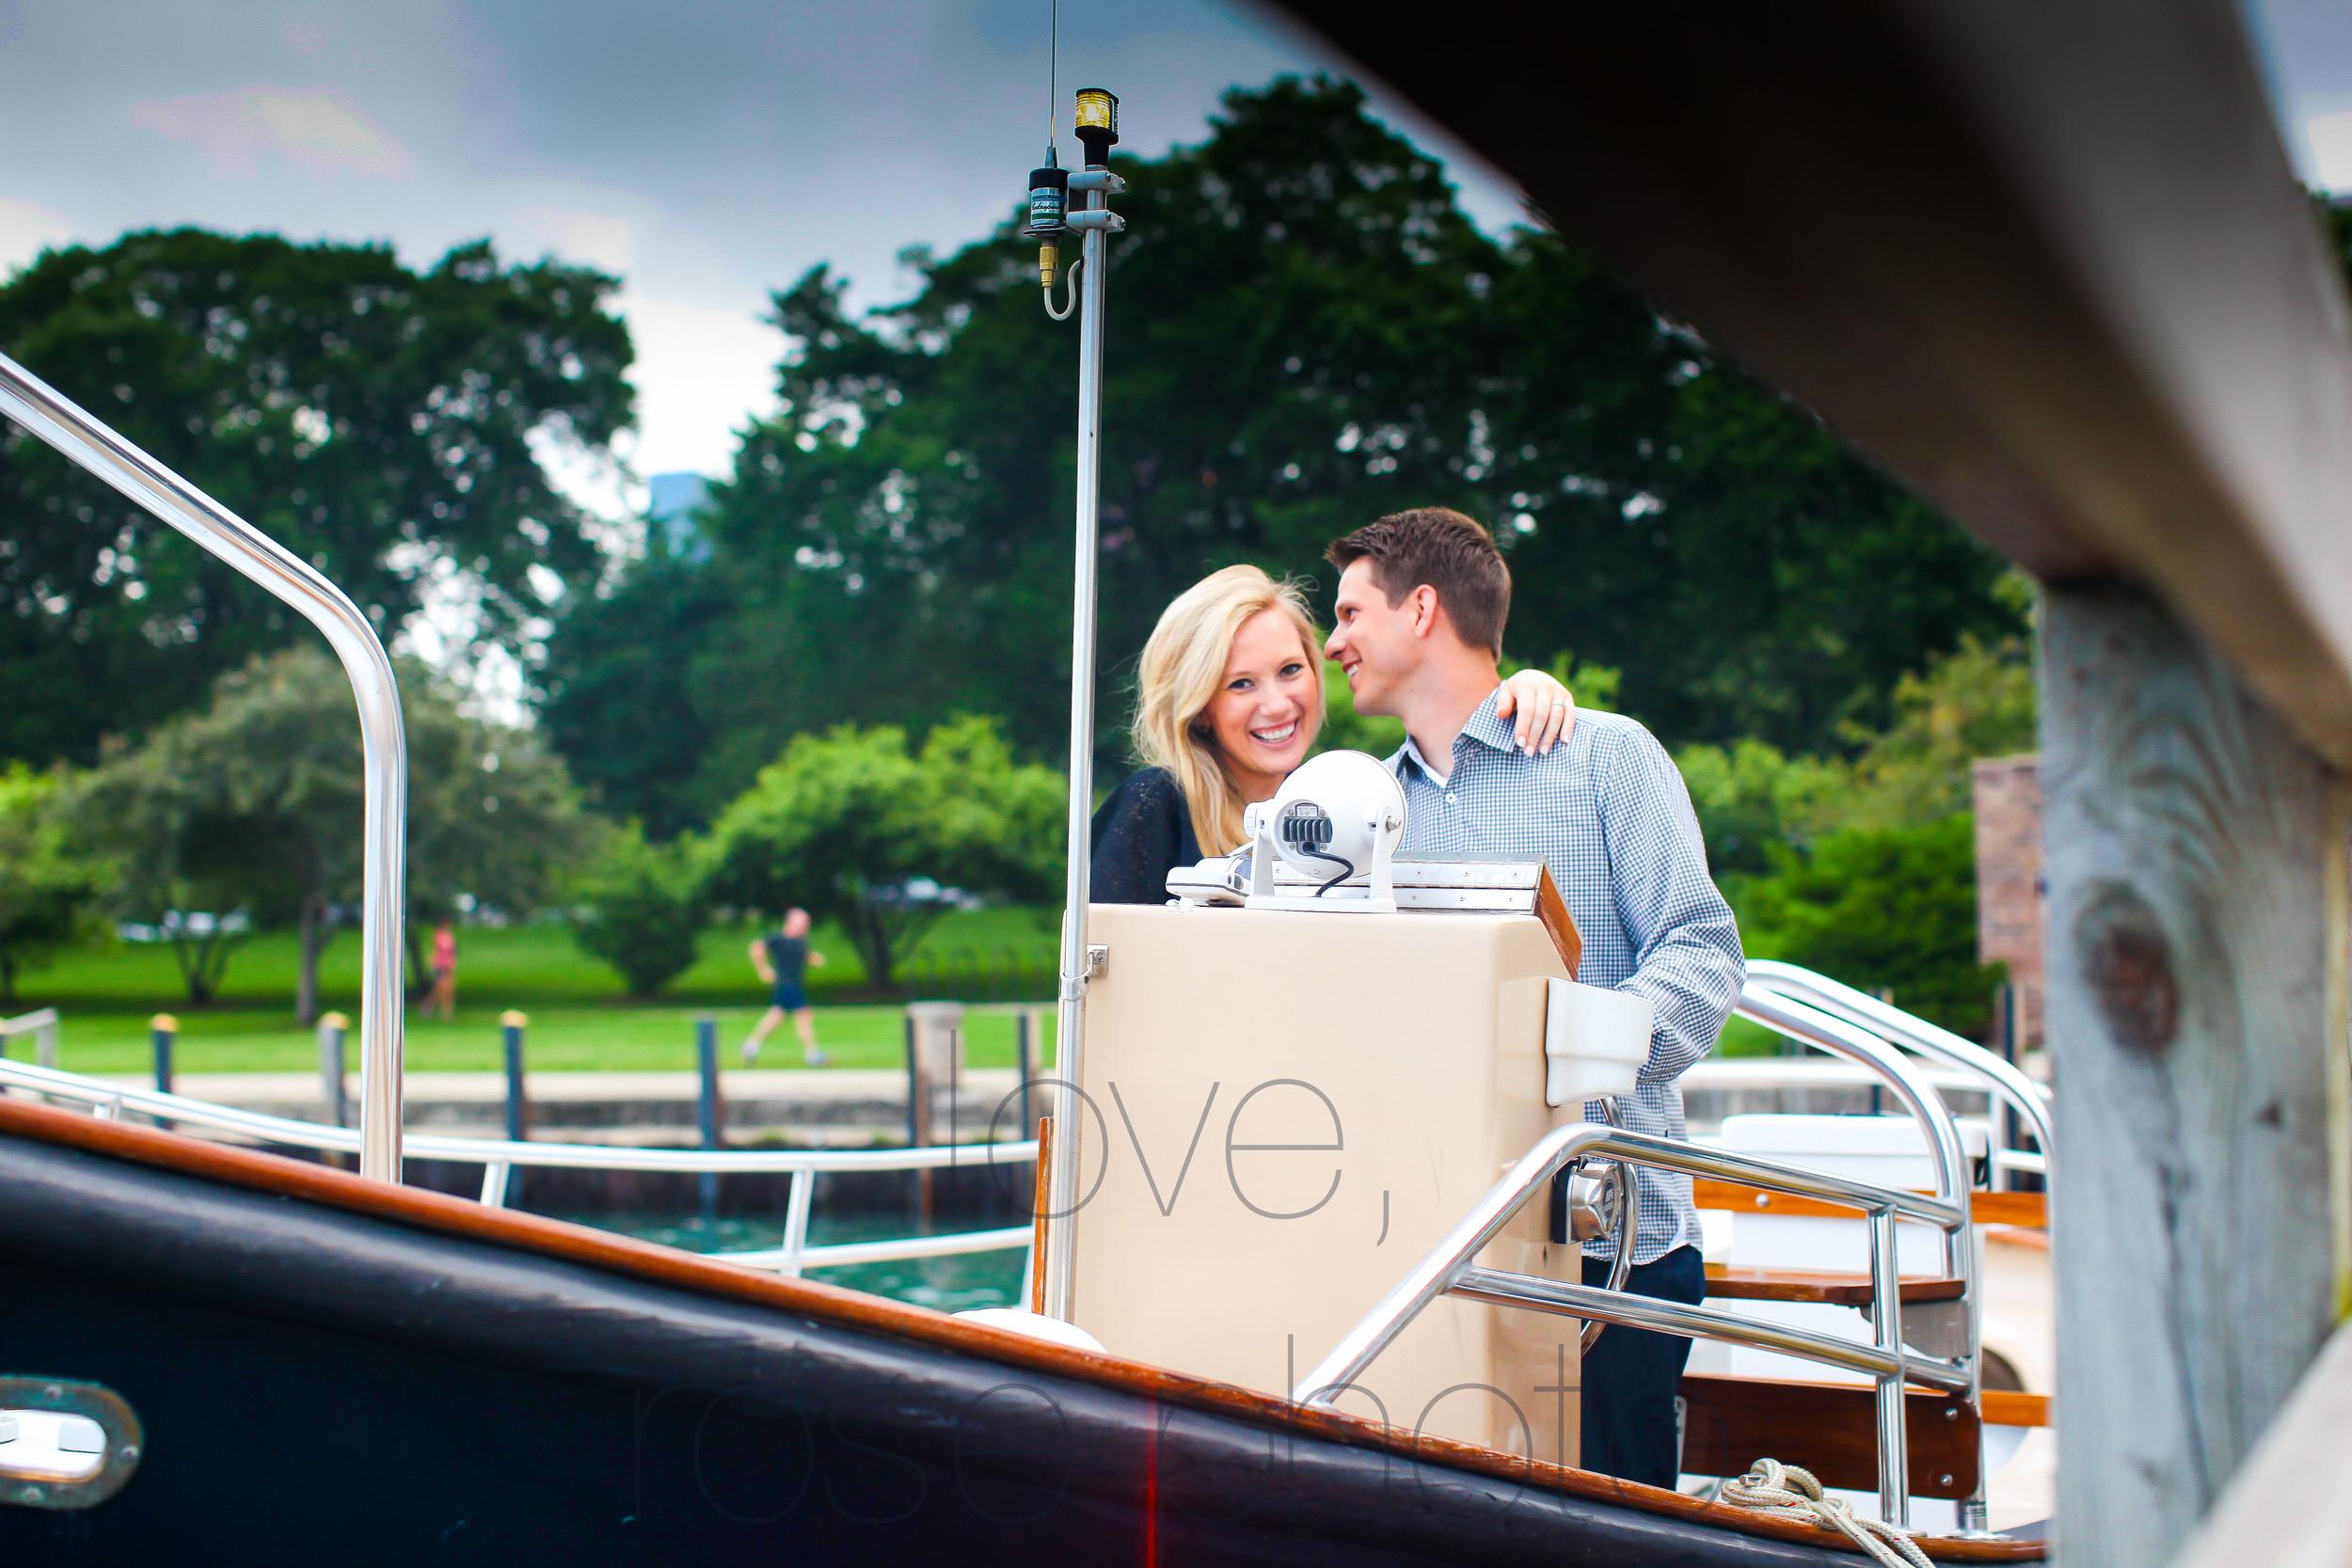 chicago yacht club lake front engagement shoot olive park chicago theater wedding photographer rose photo-005.jpg